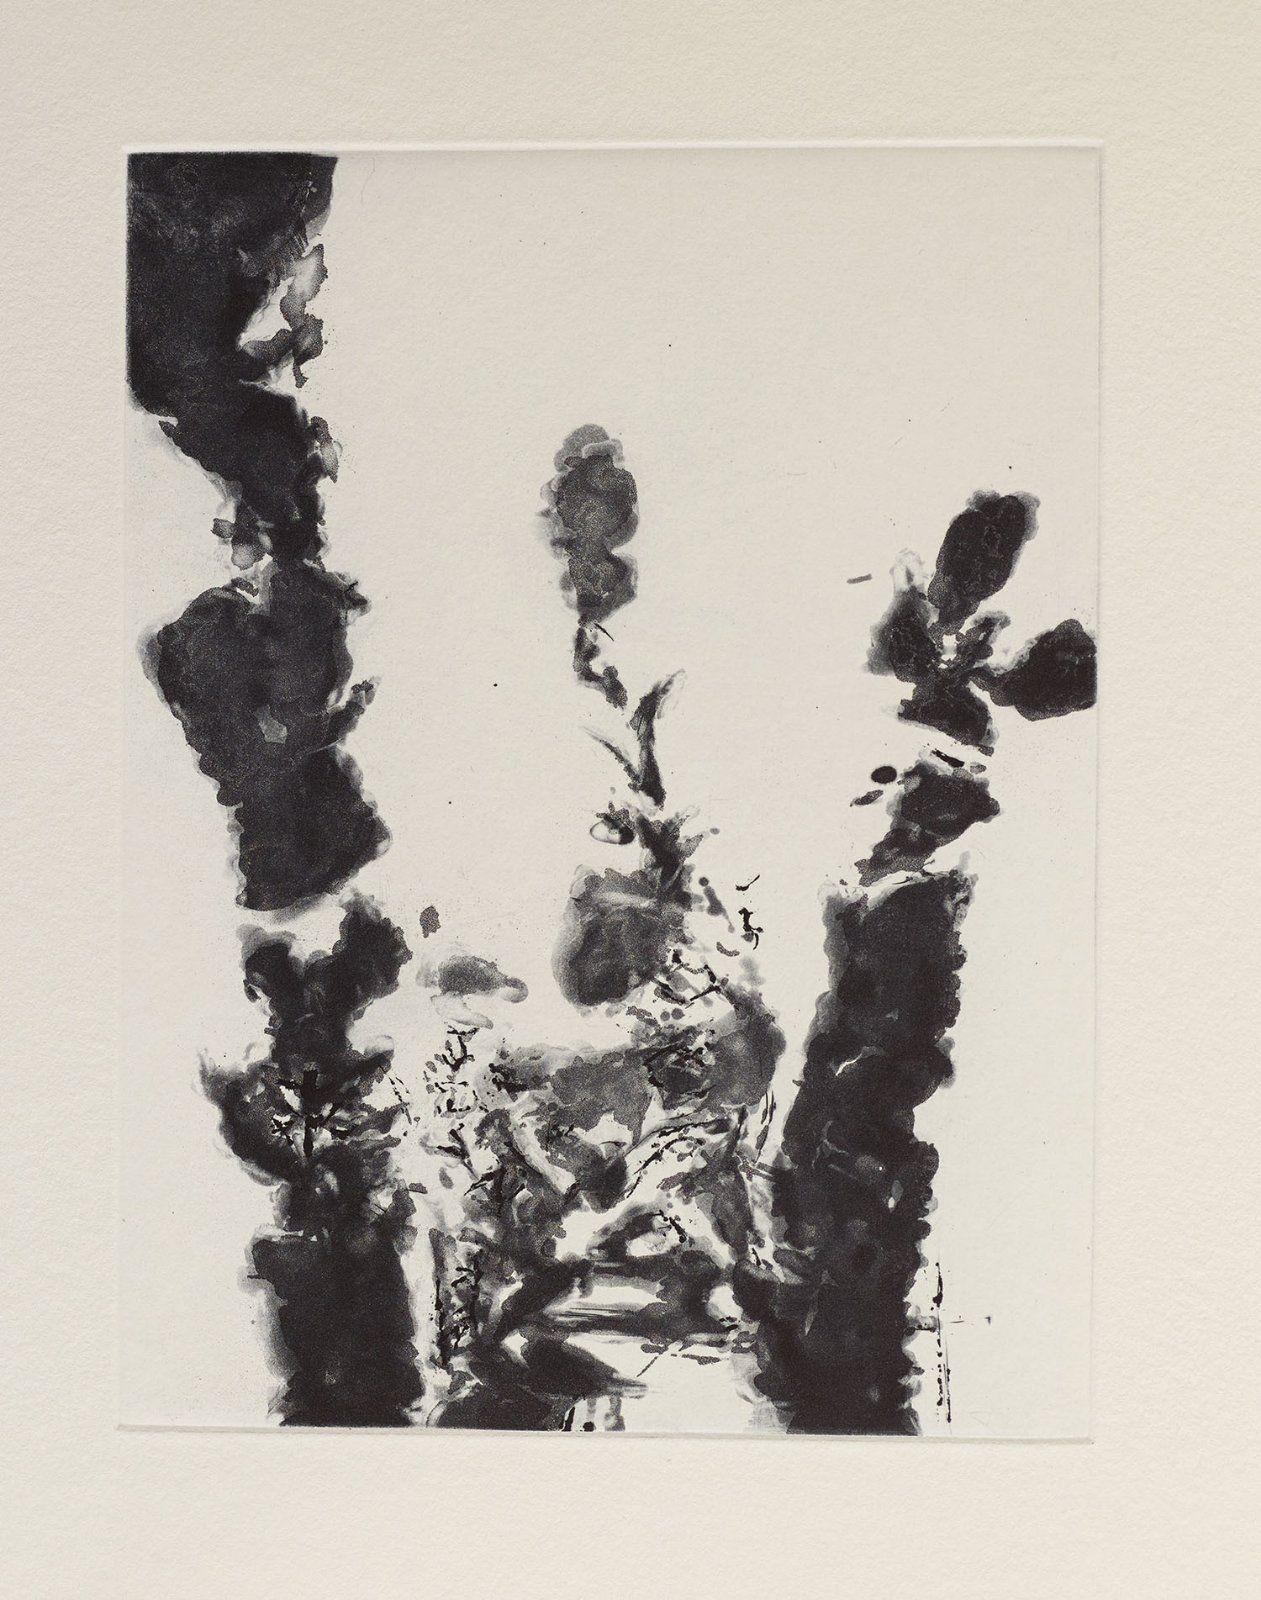 Zao Wou-Ki - XXIV Sonnets de Shakespeare, 1994